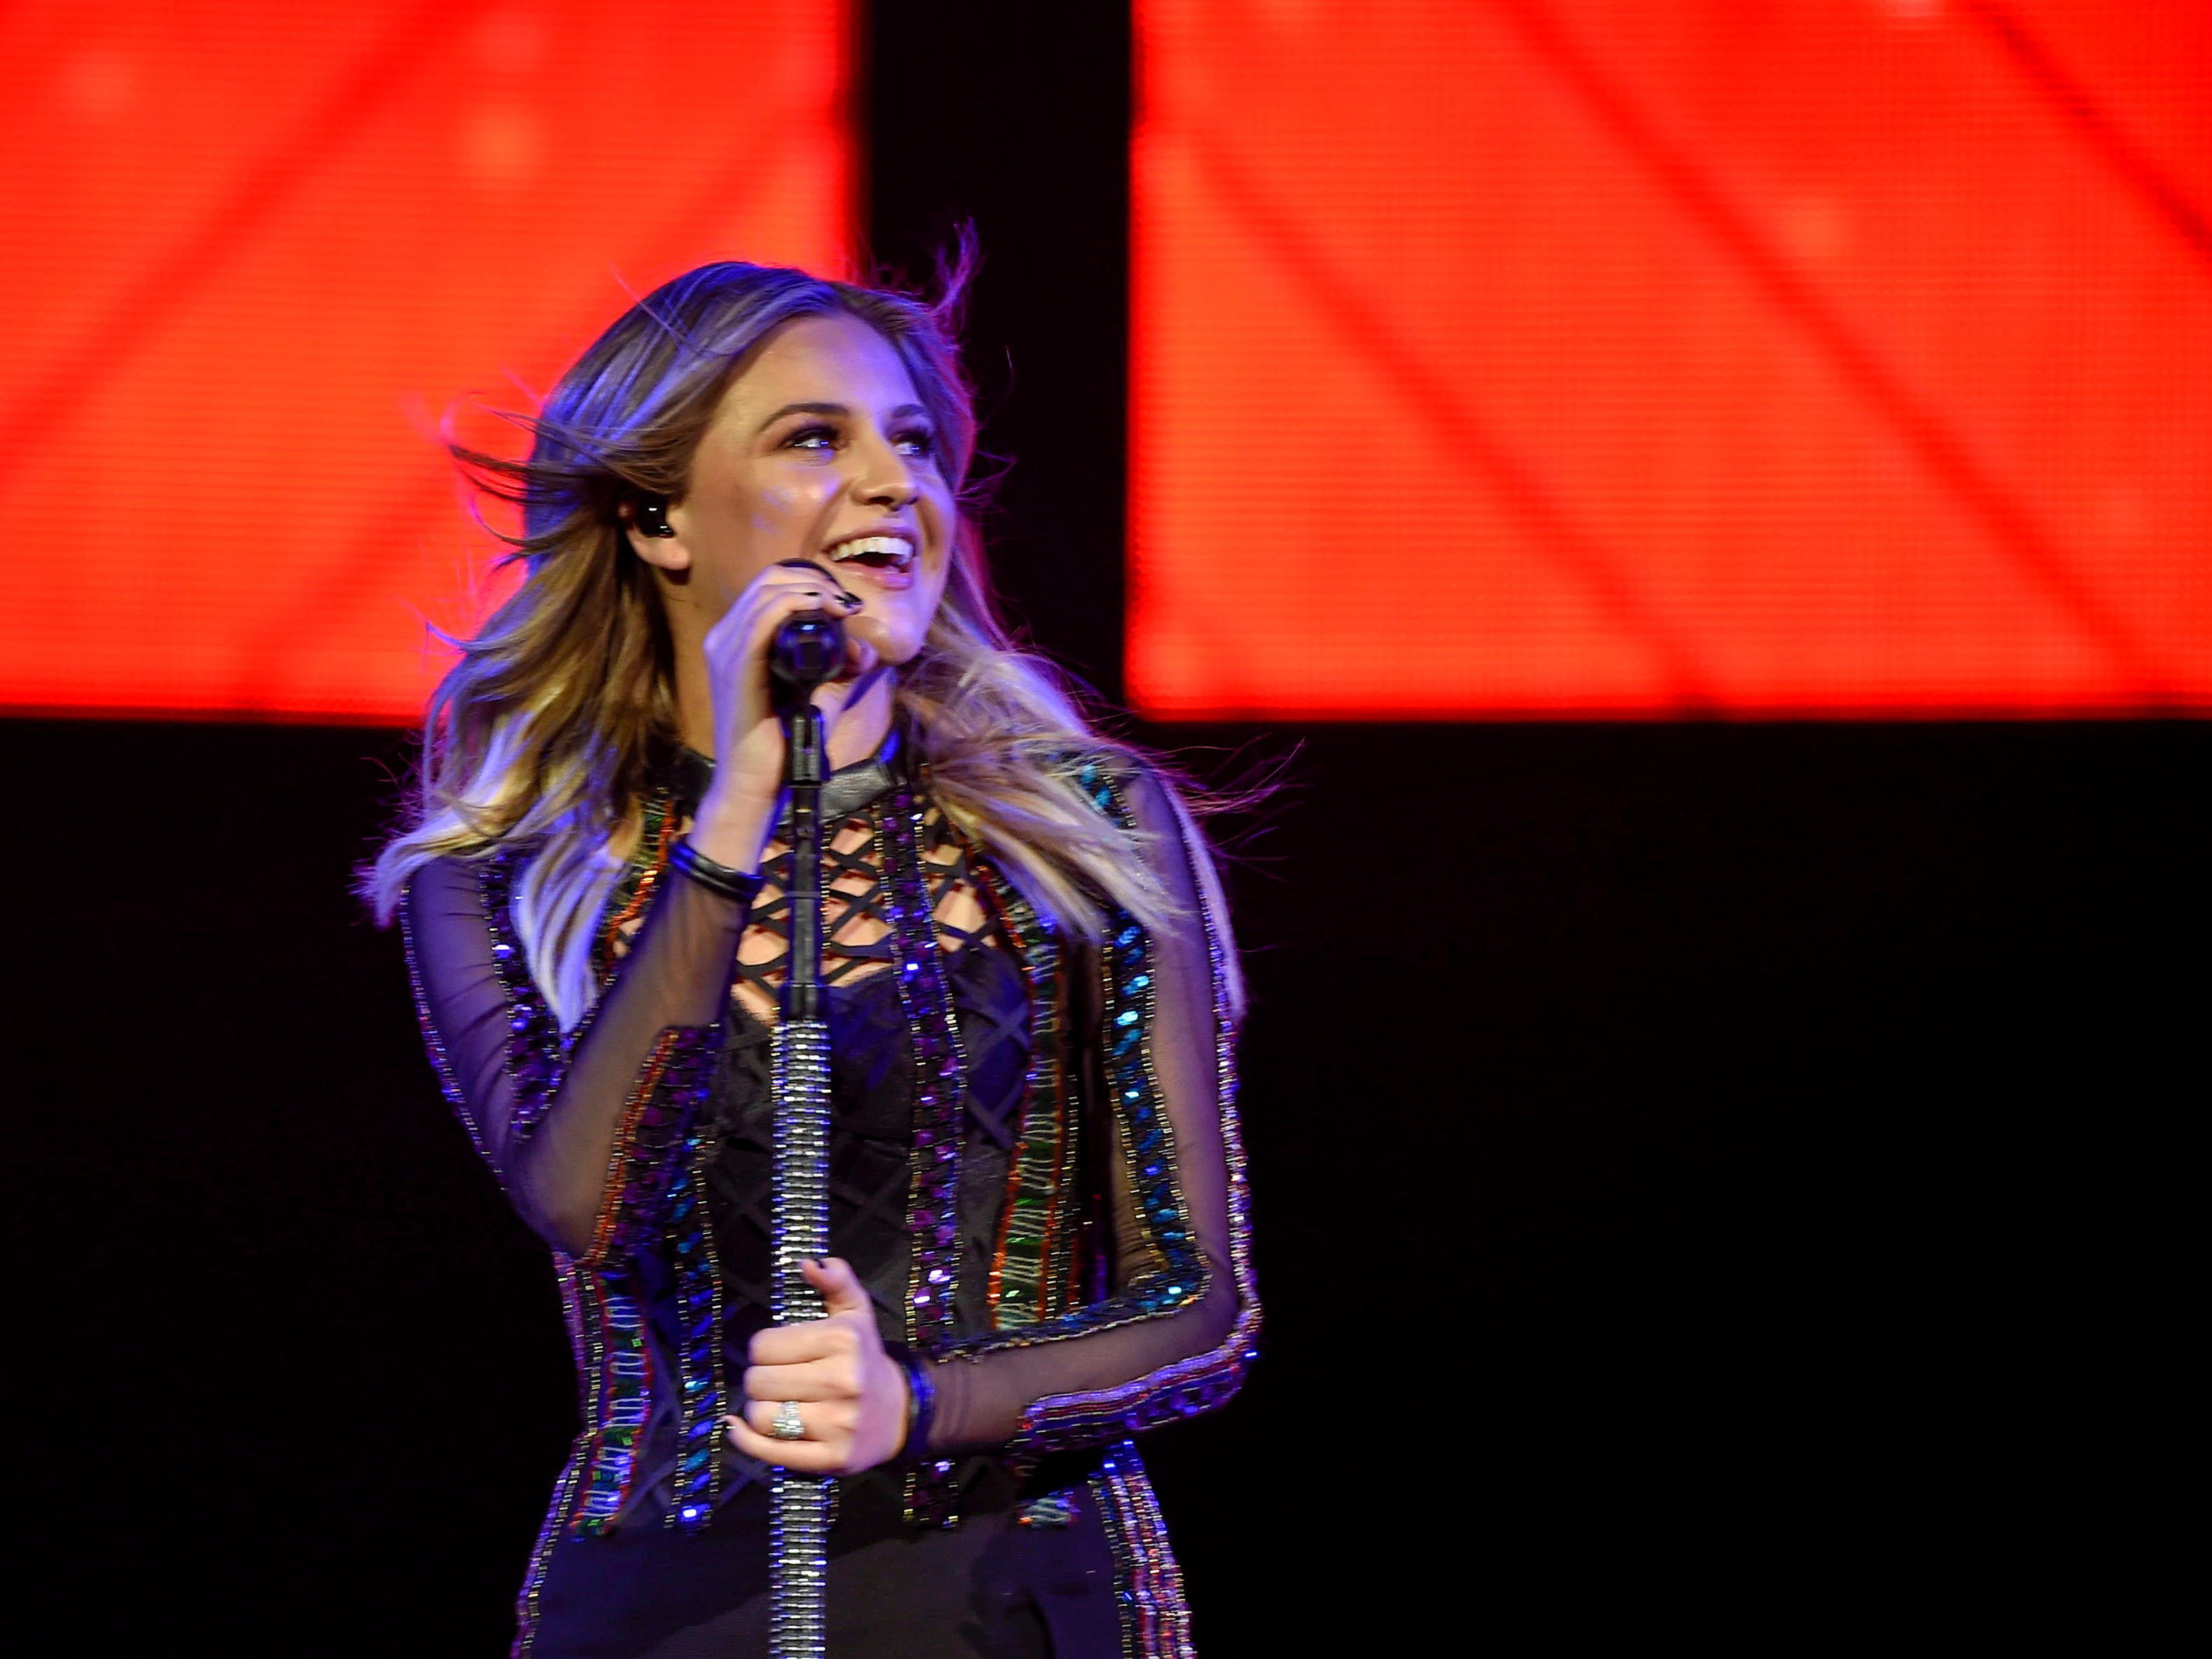 Kelsea Ballerini opens for Keith Urban at the Bridgestone Arena in Nashville, Tenn., Friday, Aug. 24, 2018.